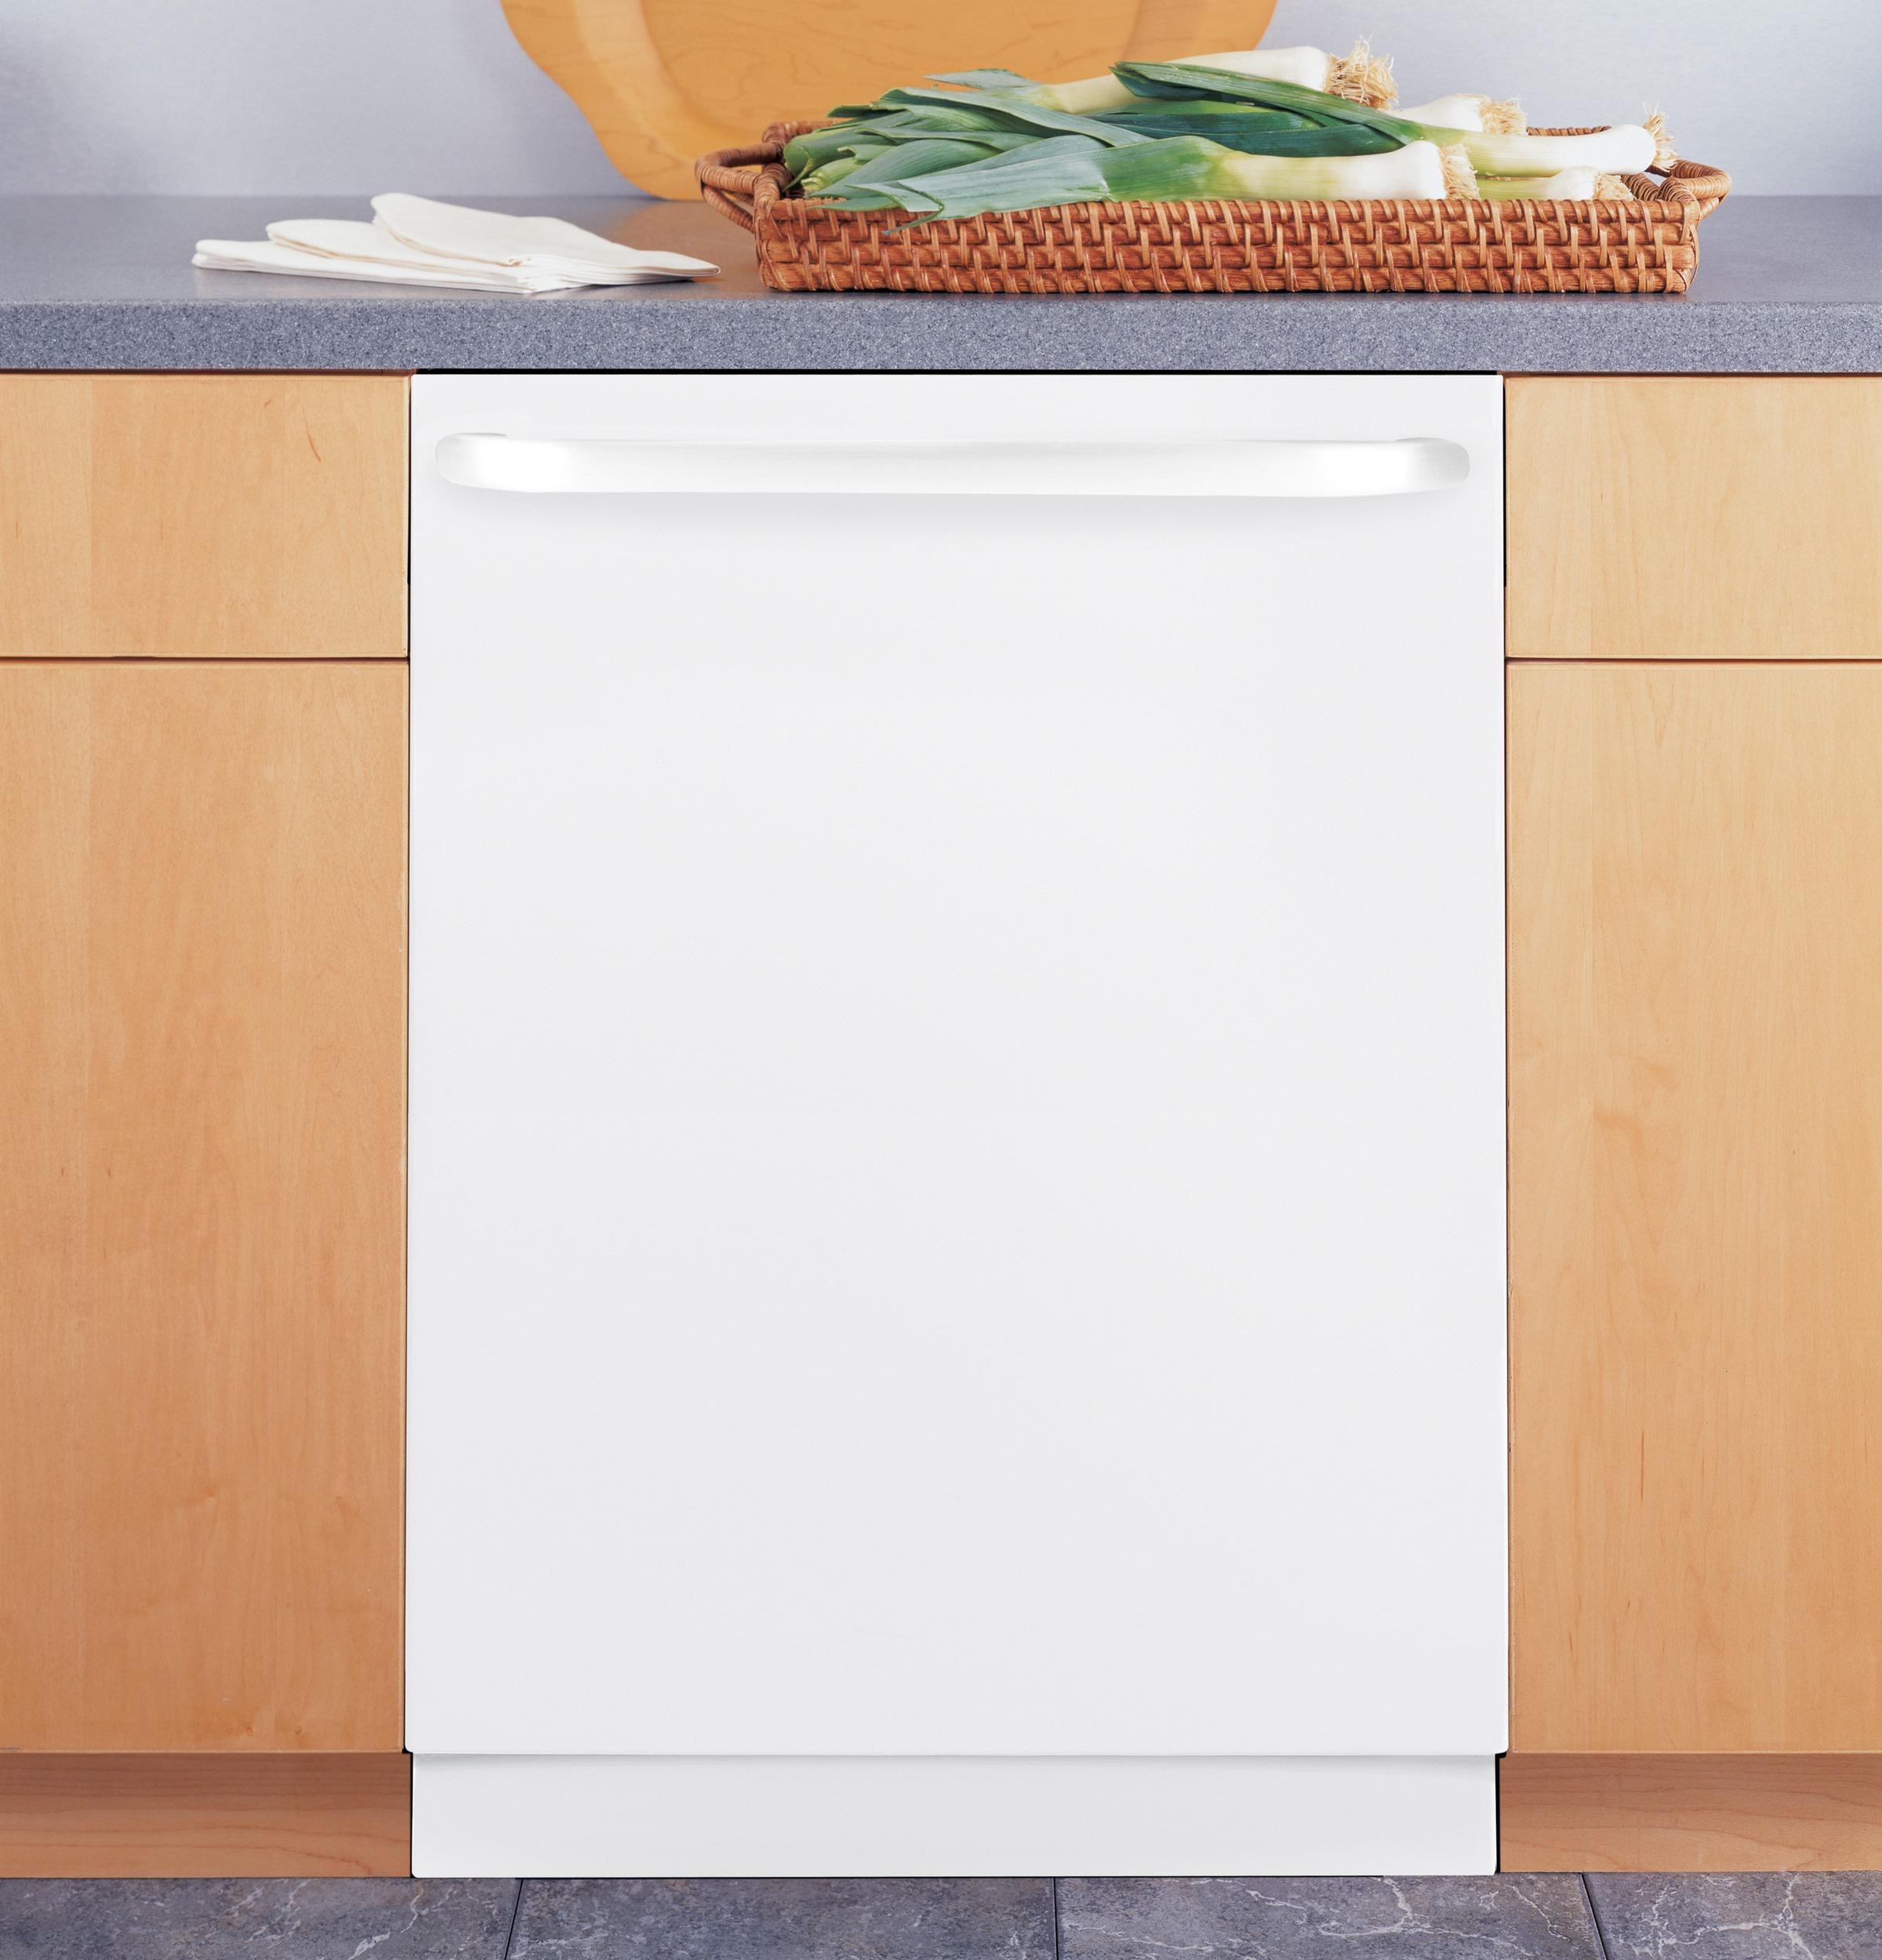 "GE Appliances GLDT690DWW 24"" Built-In White Dishwasher"